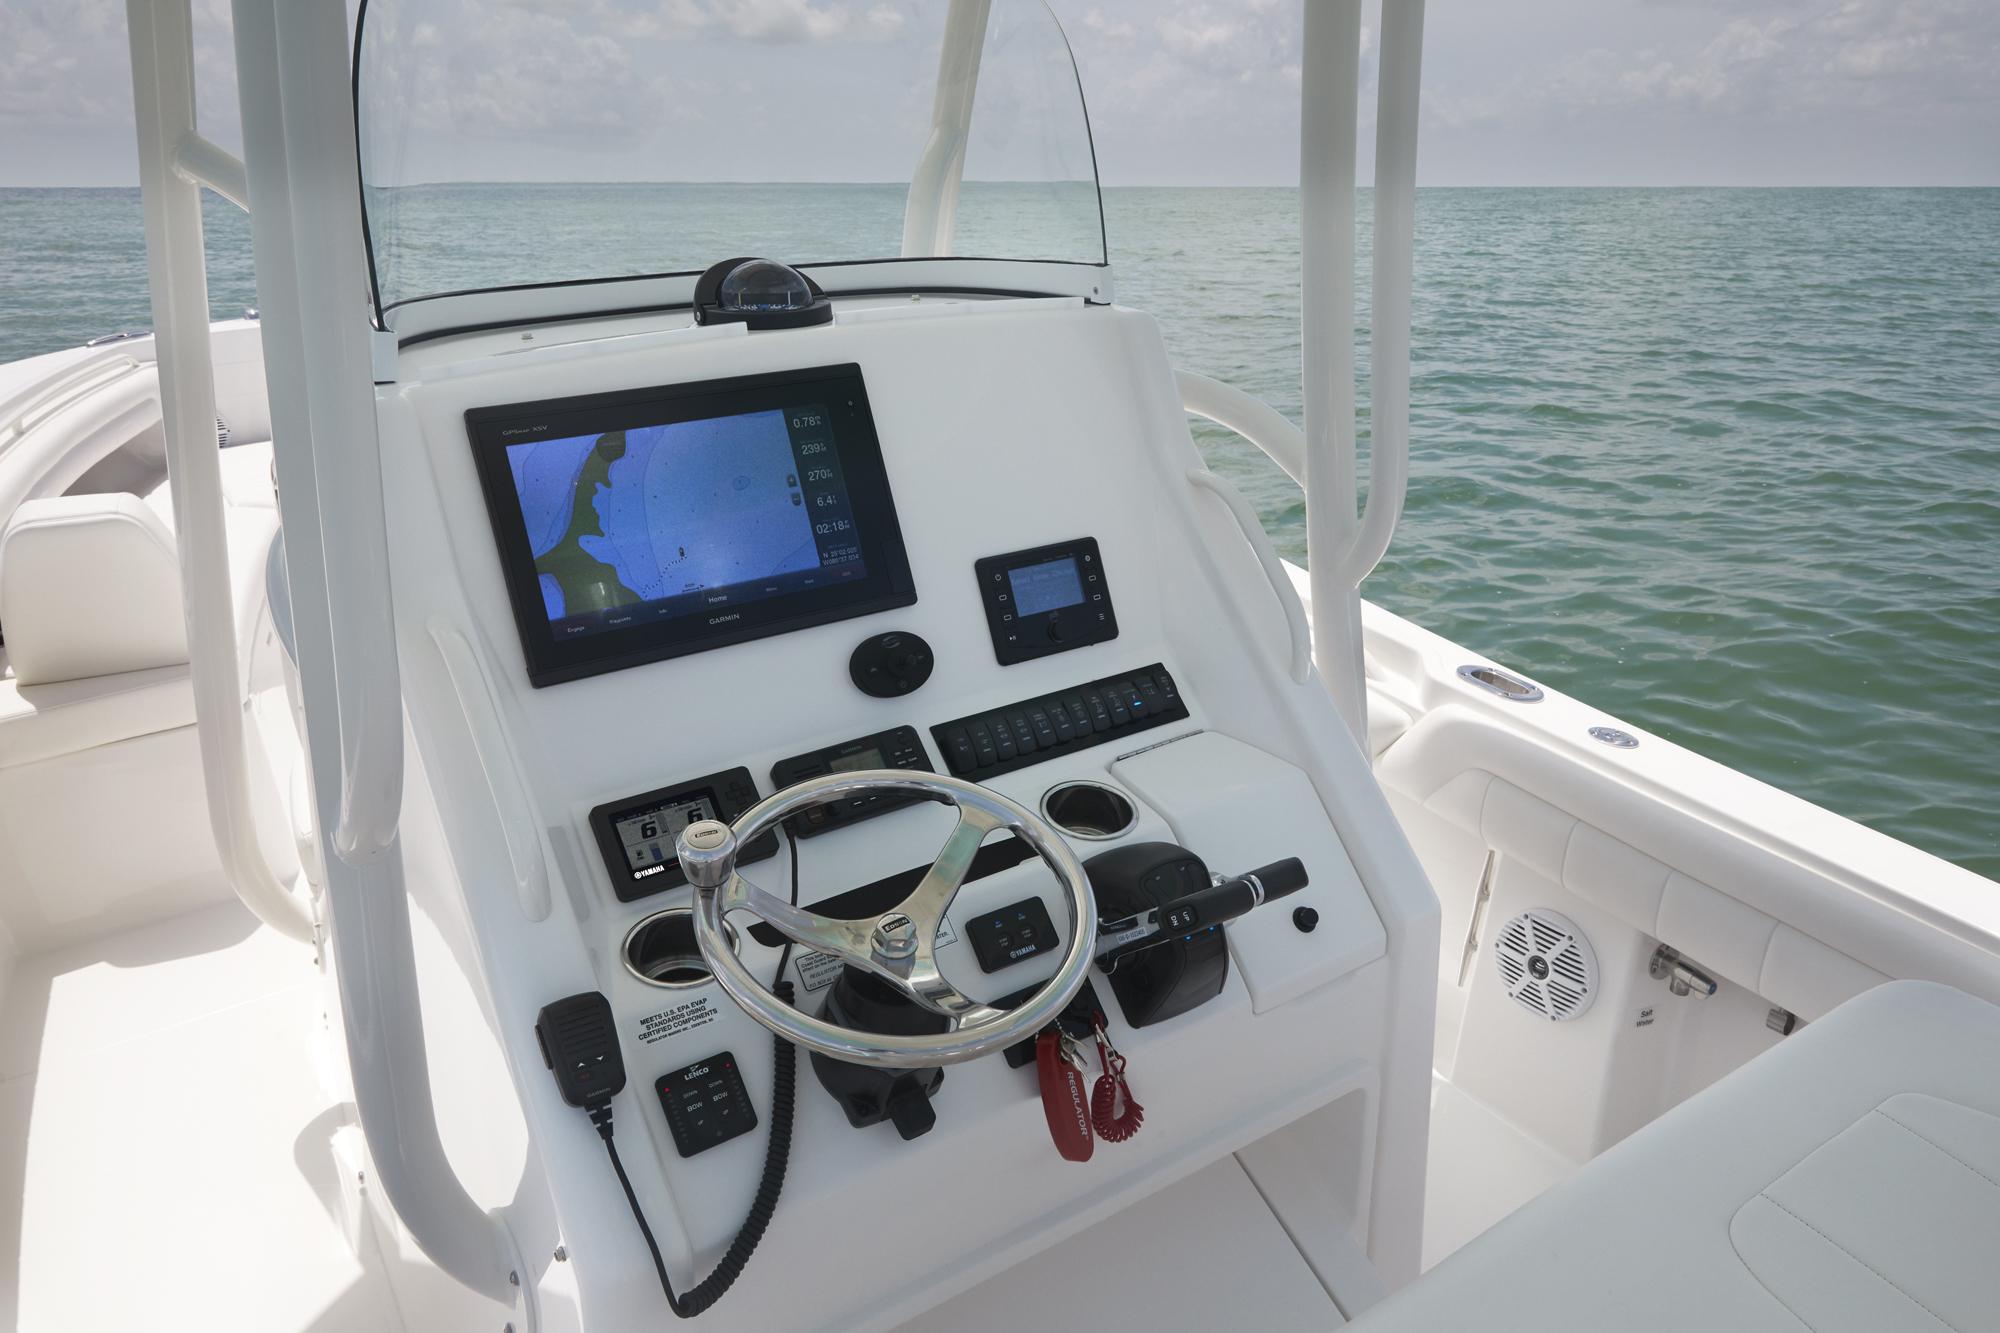 Regulator Center Console Boat Helm Garmin Electronics on Boat Power Steering Pump